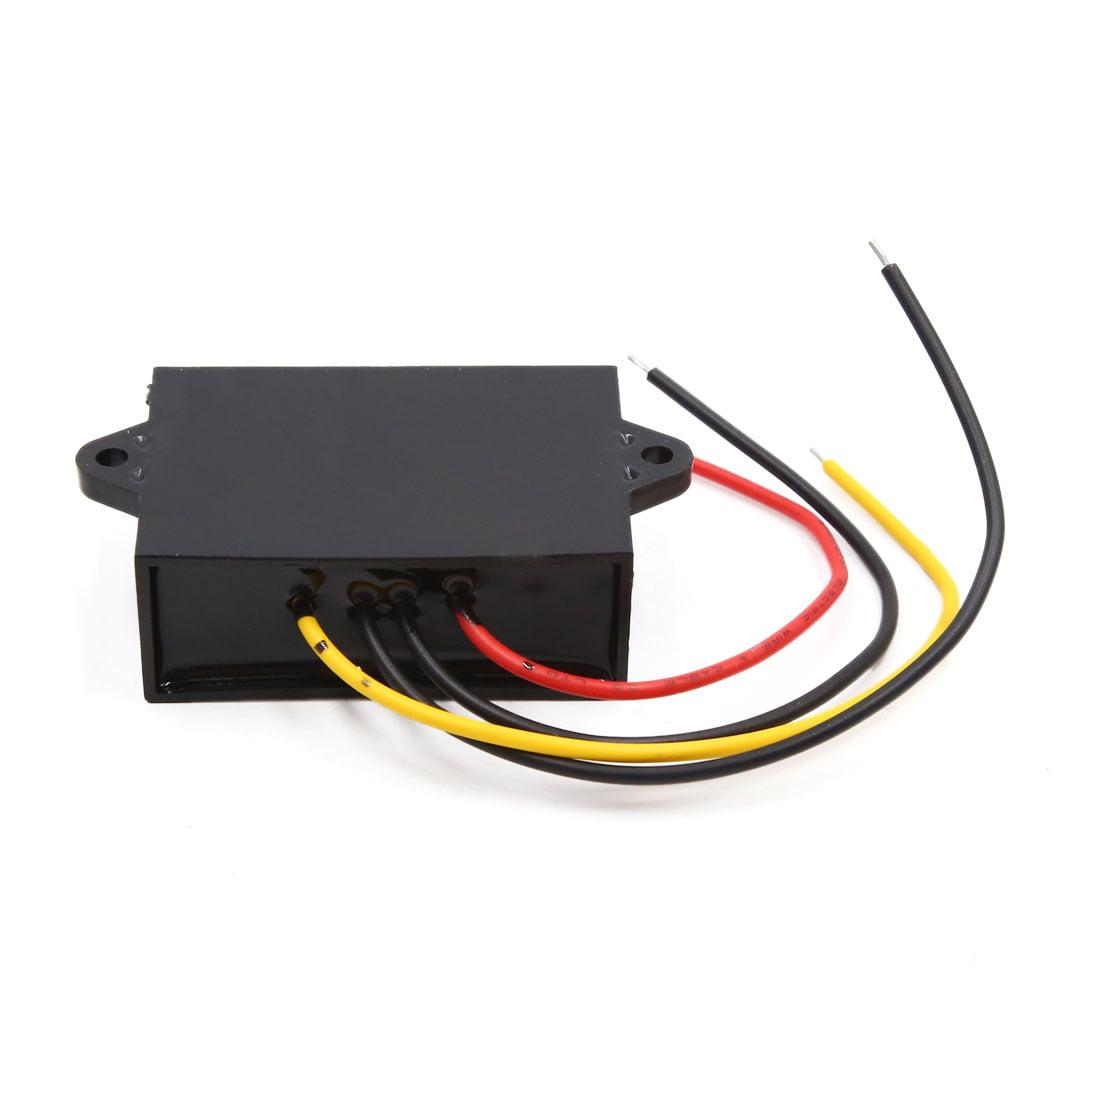 8 40v To 12v Dc 2a Car Power Supply Inverter Transformer Wiring Supplies Converter Device 24w